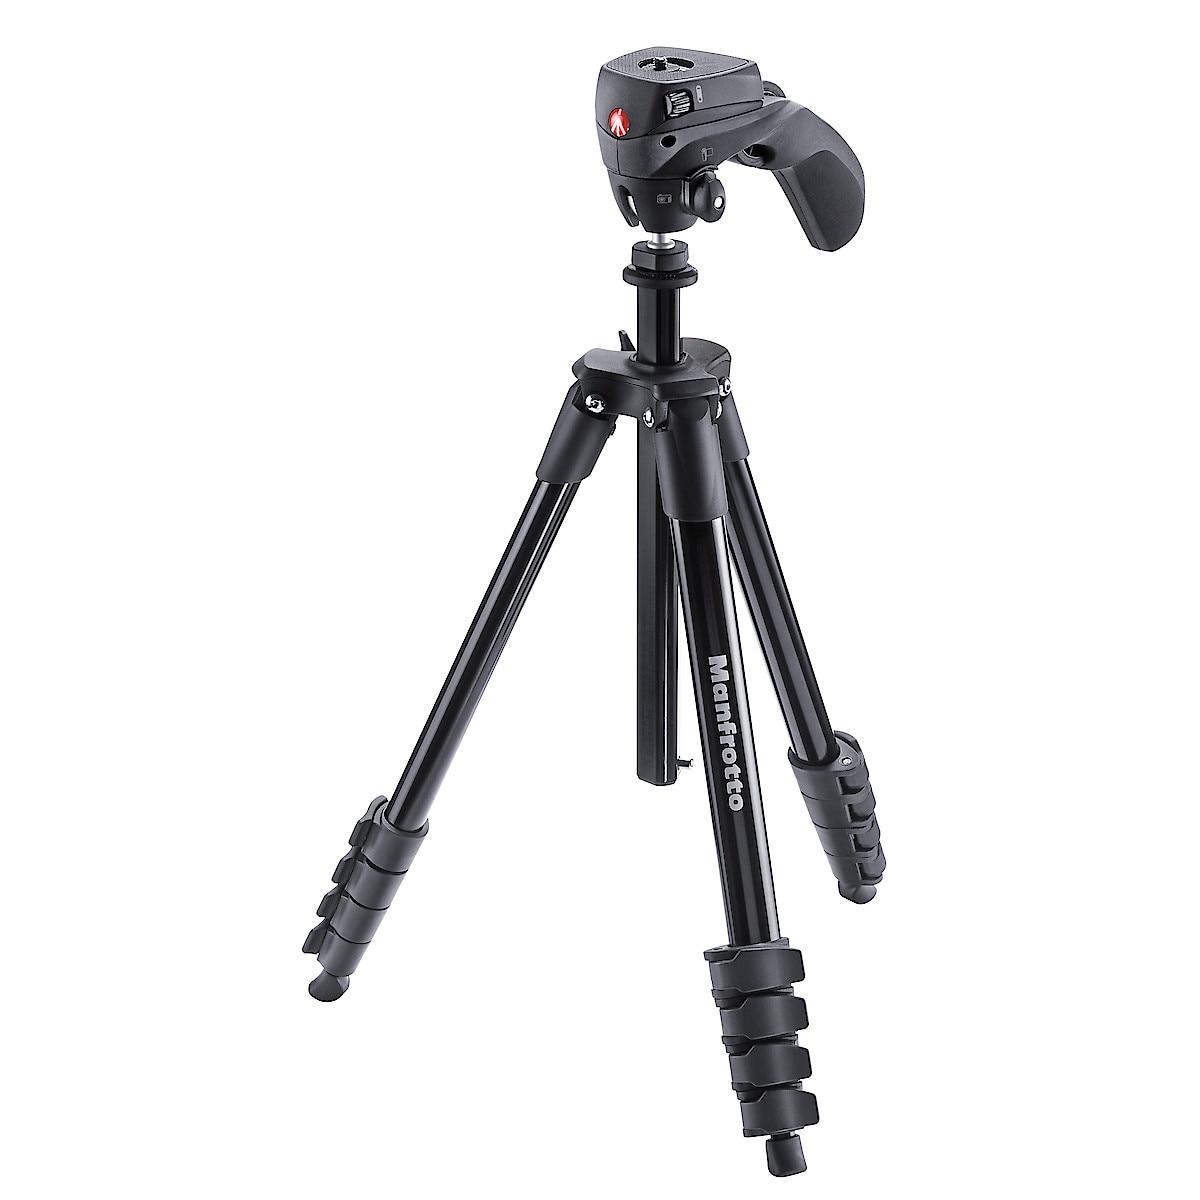 Manfrotto Compact Action kamerastativ